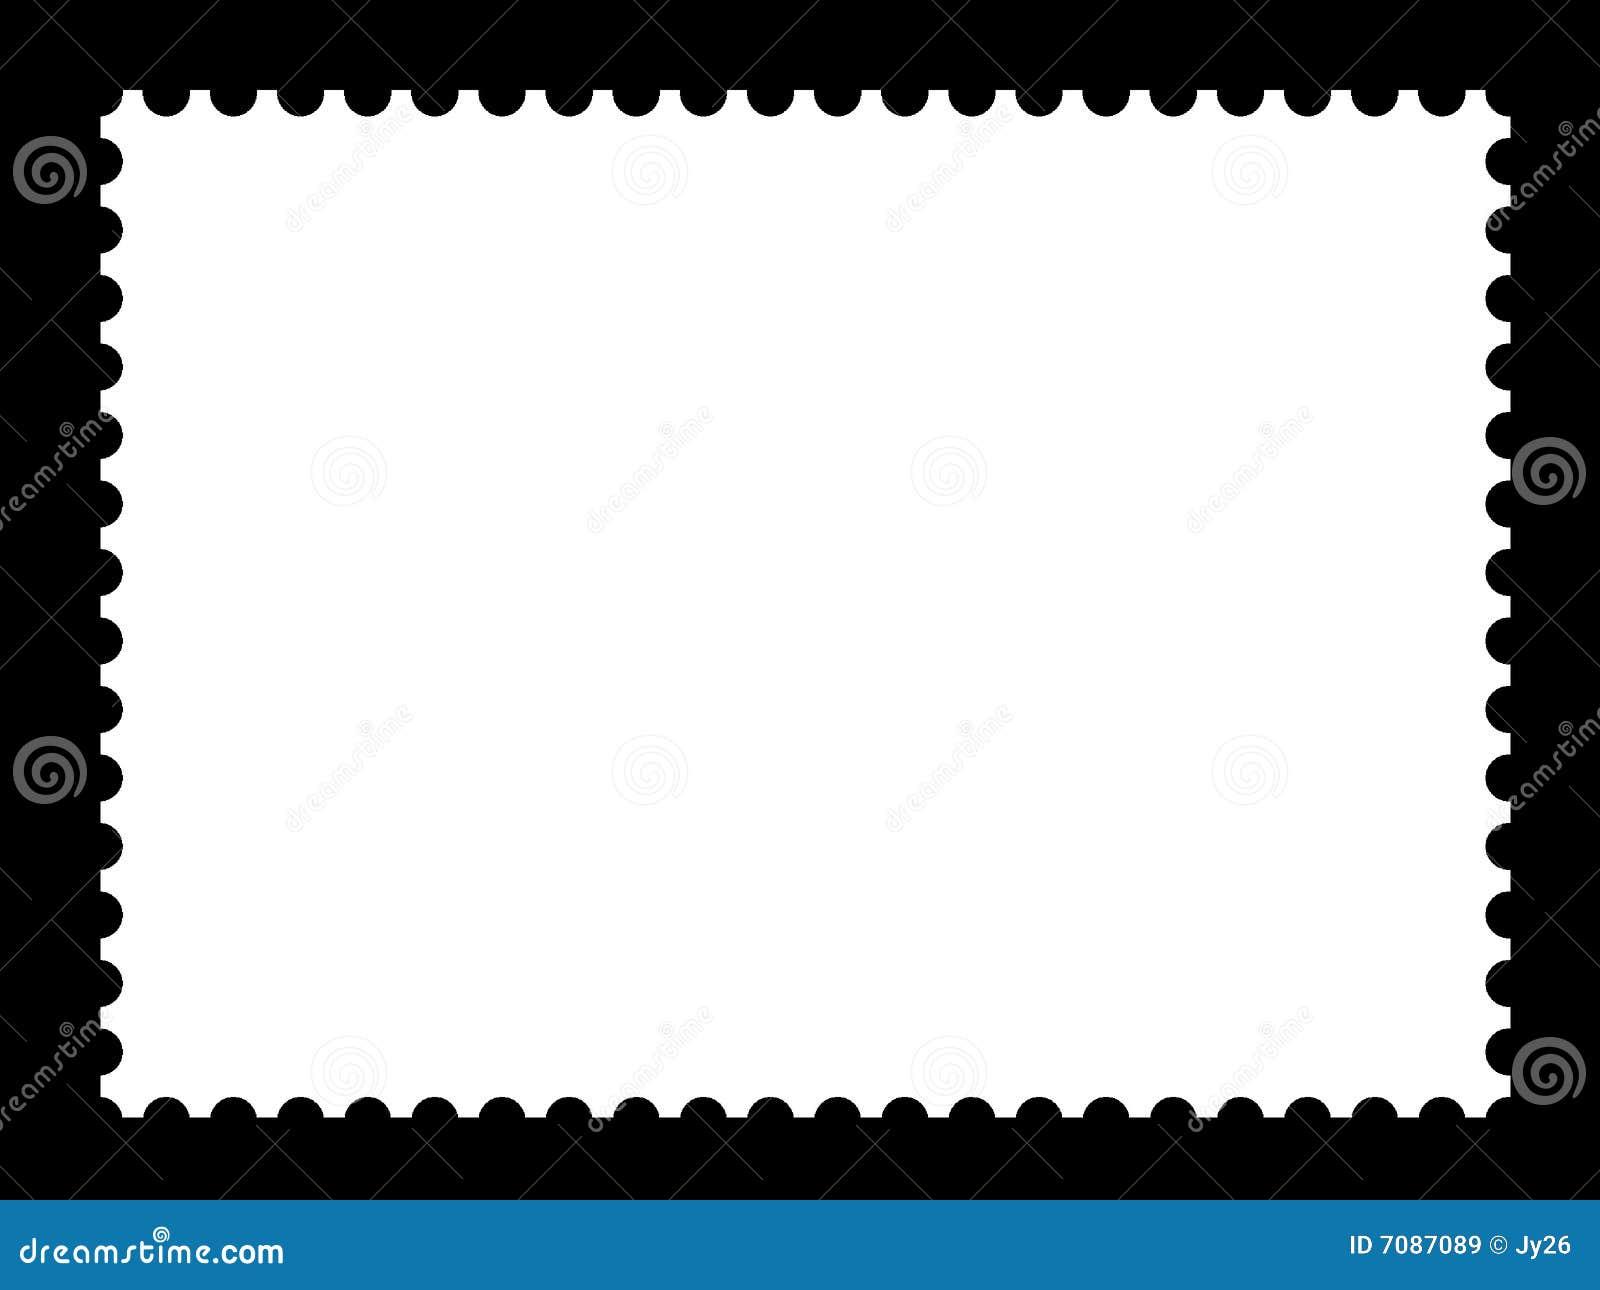 Stamp Template | A Blank Stamp Templates Stock Illustration Illustration Of Album